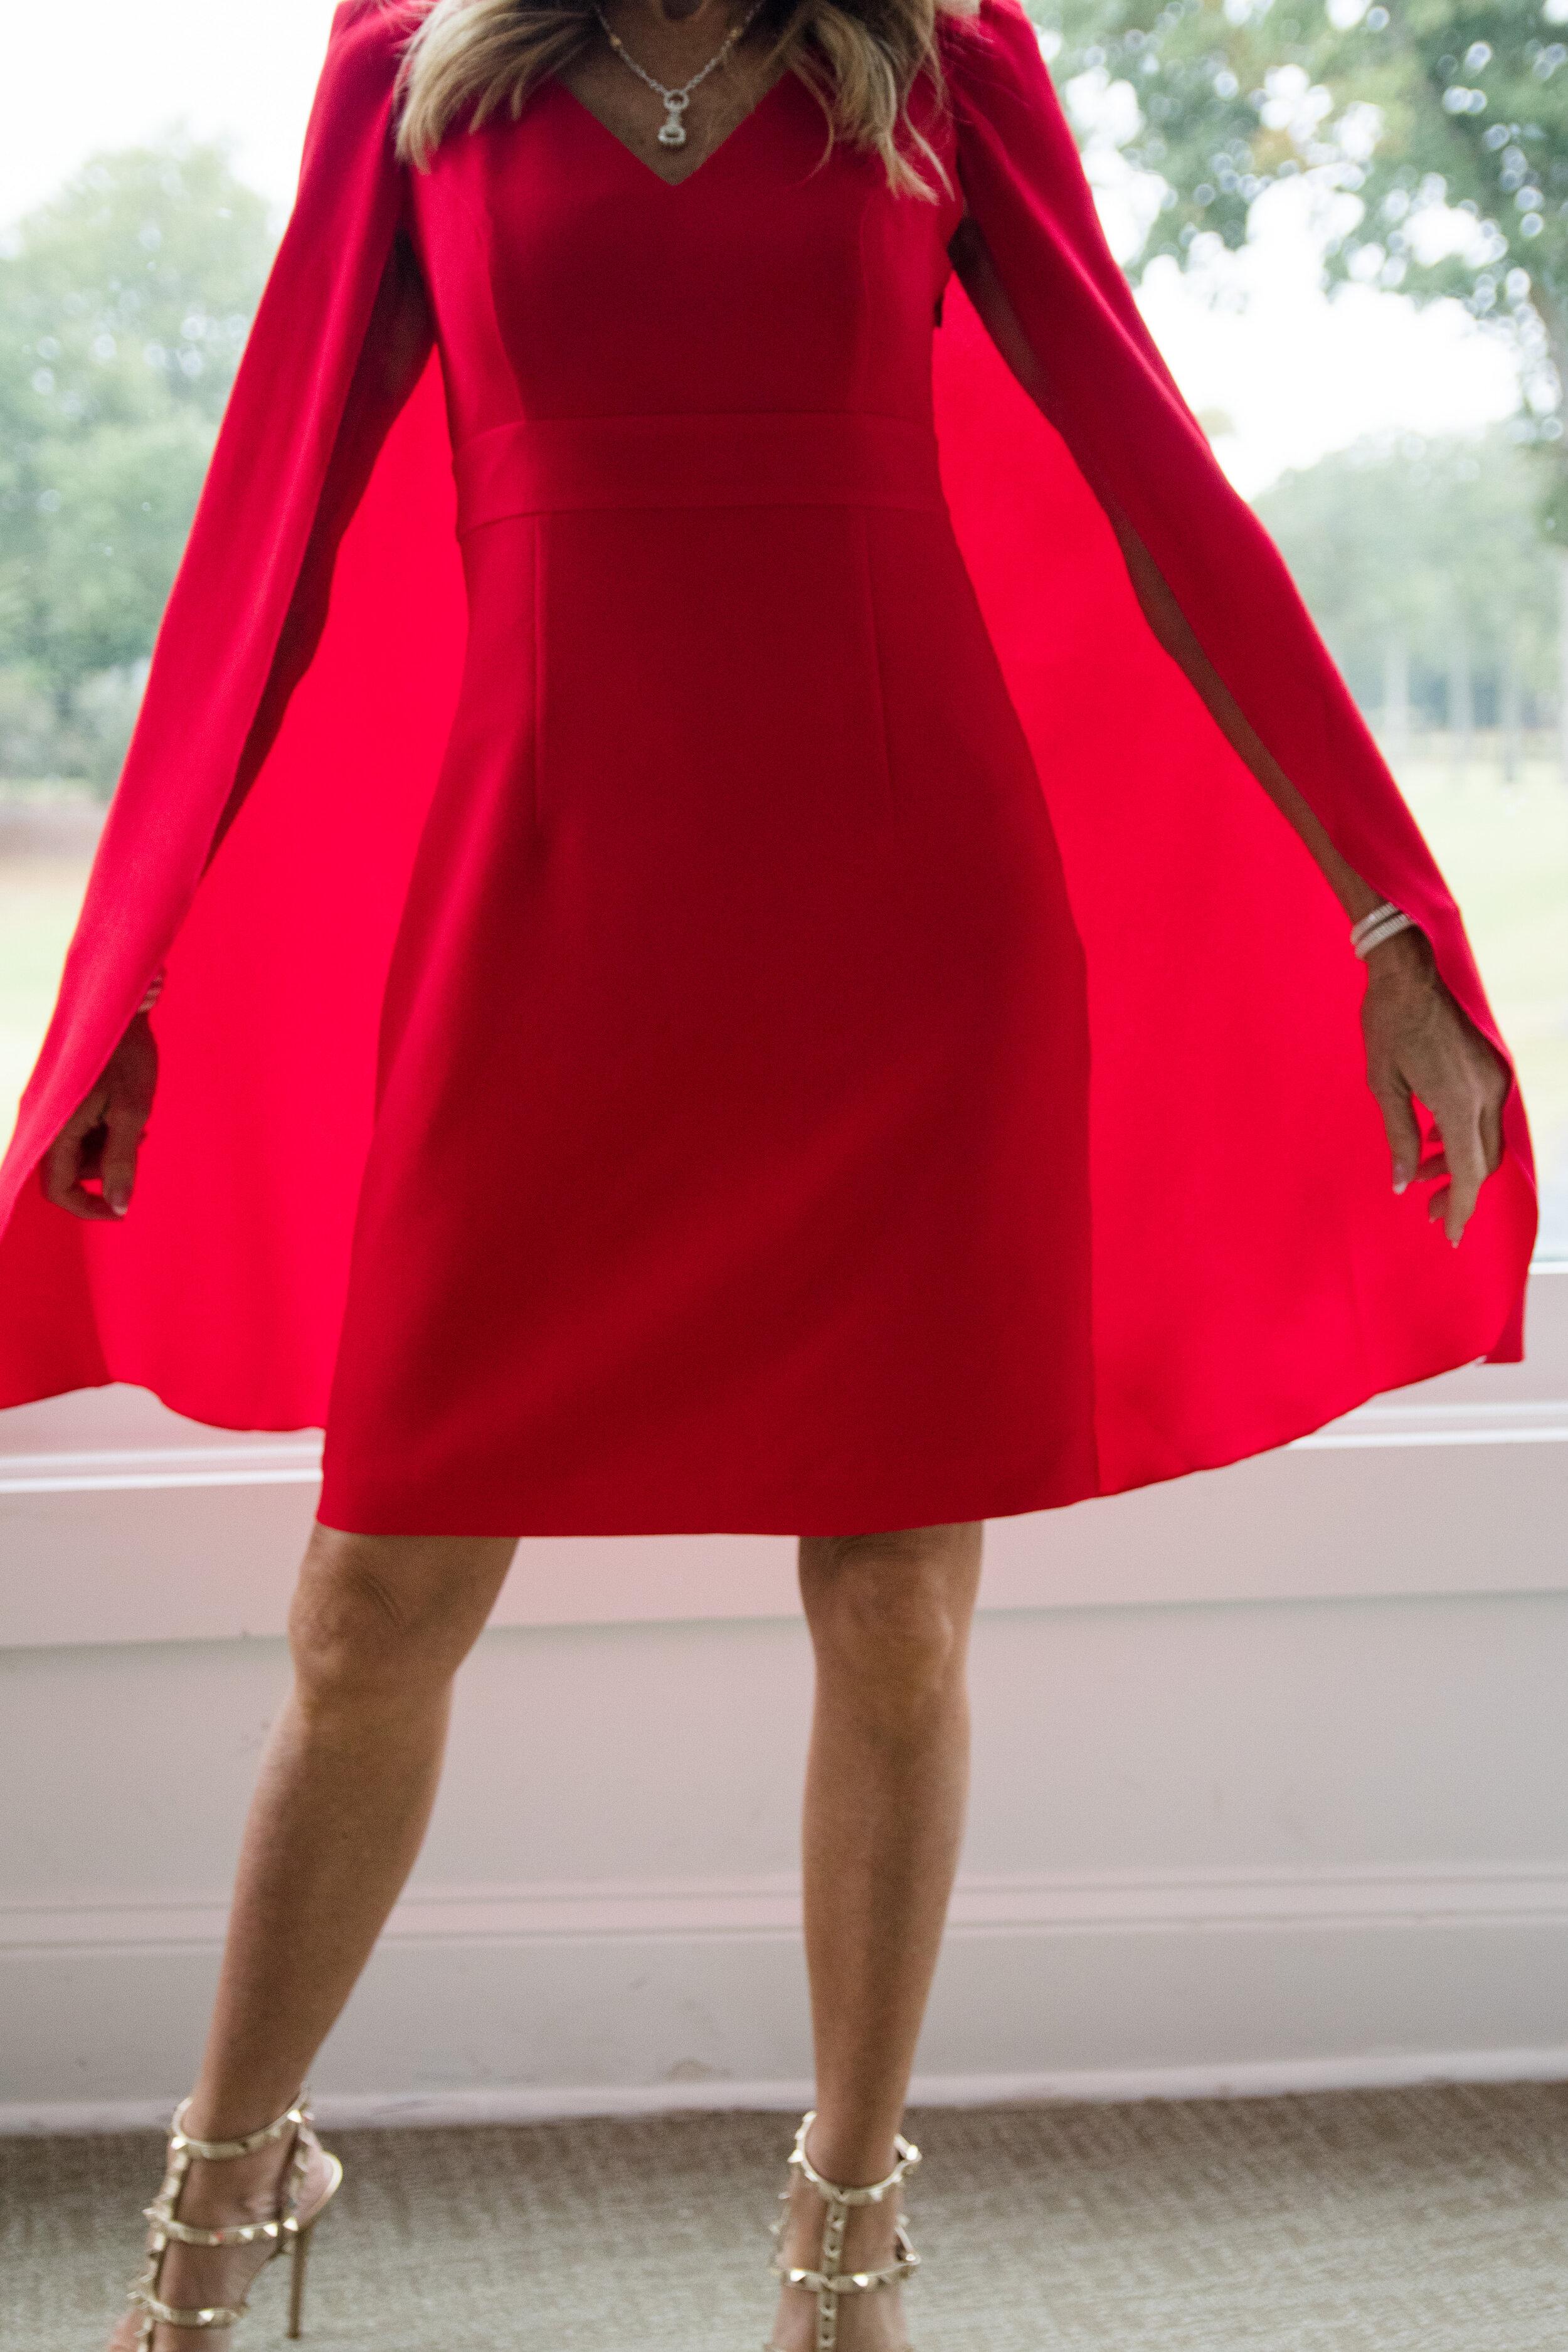 Trina Turk Holiday Dress - Crazy Blonde Life